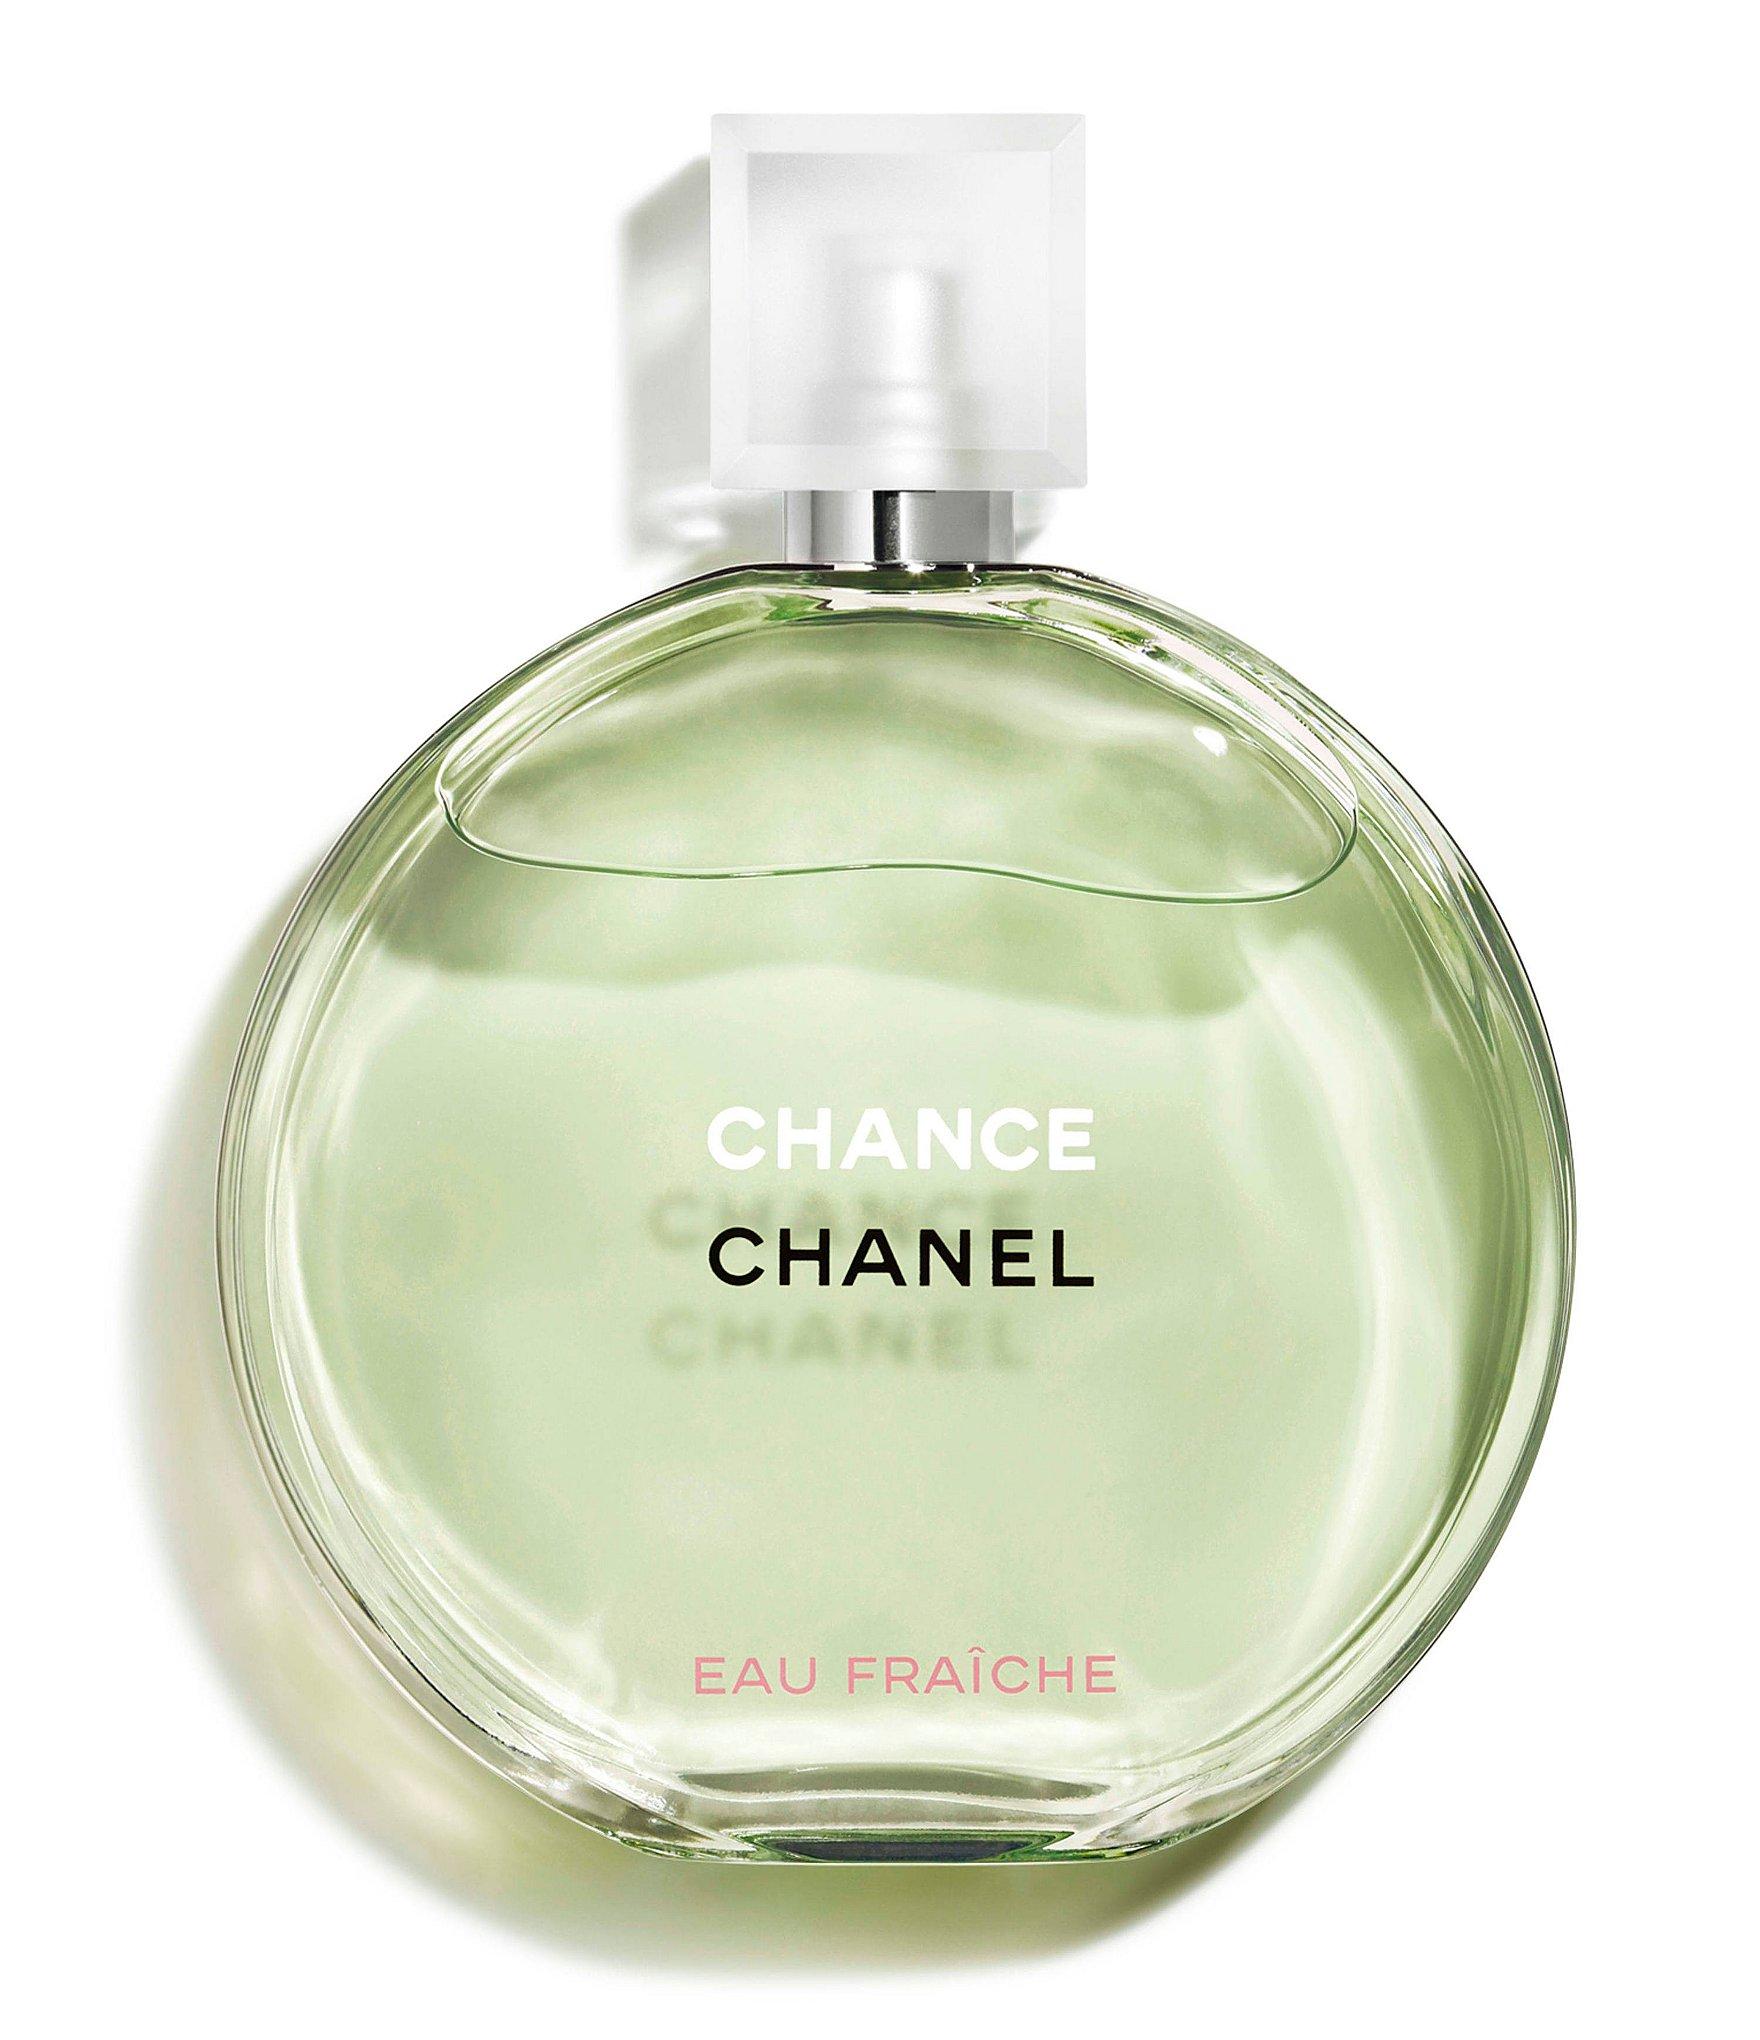 c1f932b1 Chanel CHANEL CHANCE EAU FRAÎCHE EAU DE TOILETTE SPRAY   Dillard's